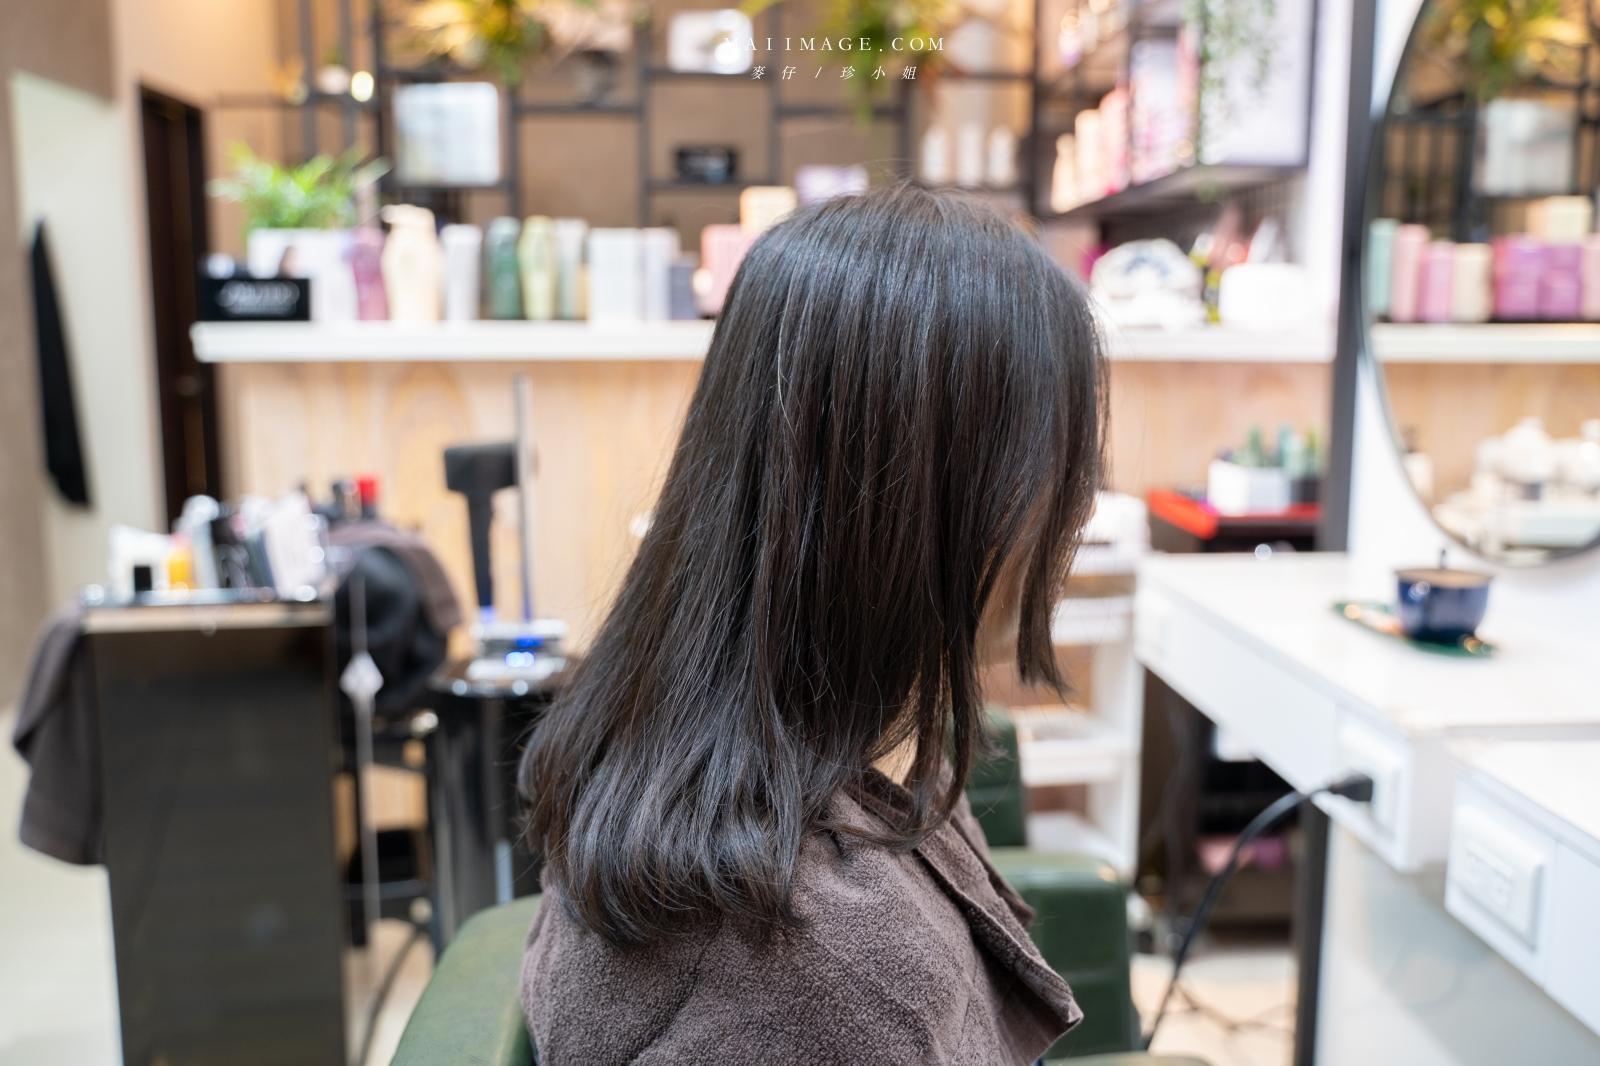 V+hair|珍小姐最愛設計師新開店,過年不漲價還有折扣優惠,台中逢甲髮型設計推薦,台中染髮推薦、台中燙髮推薦